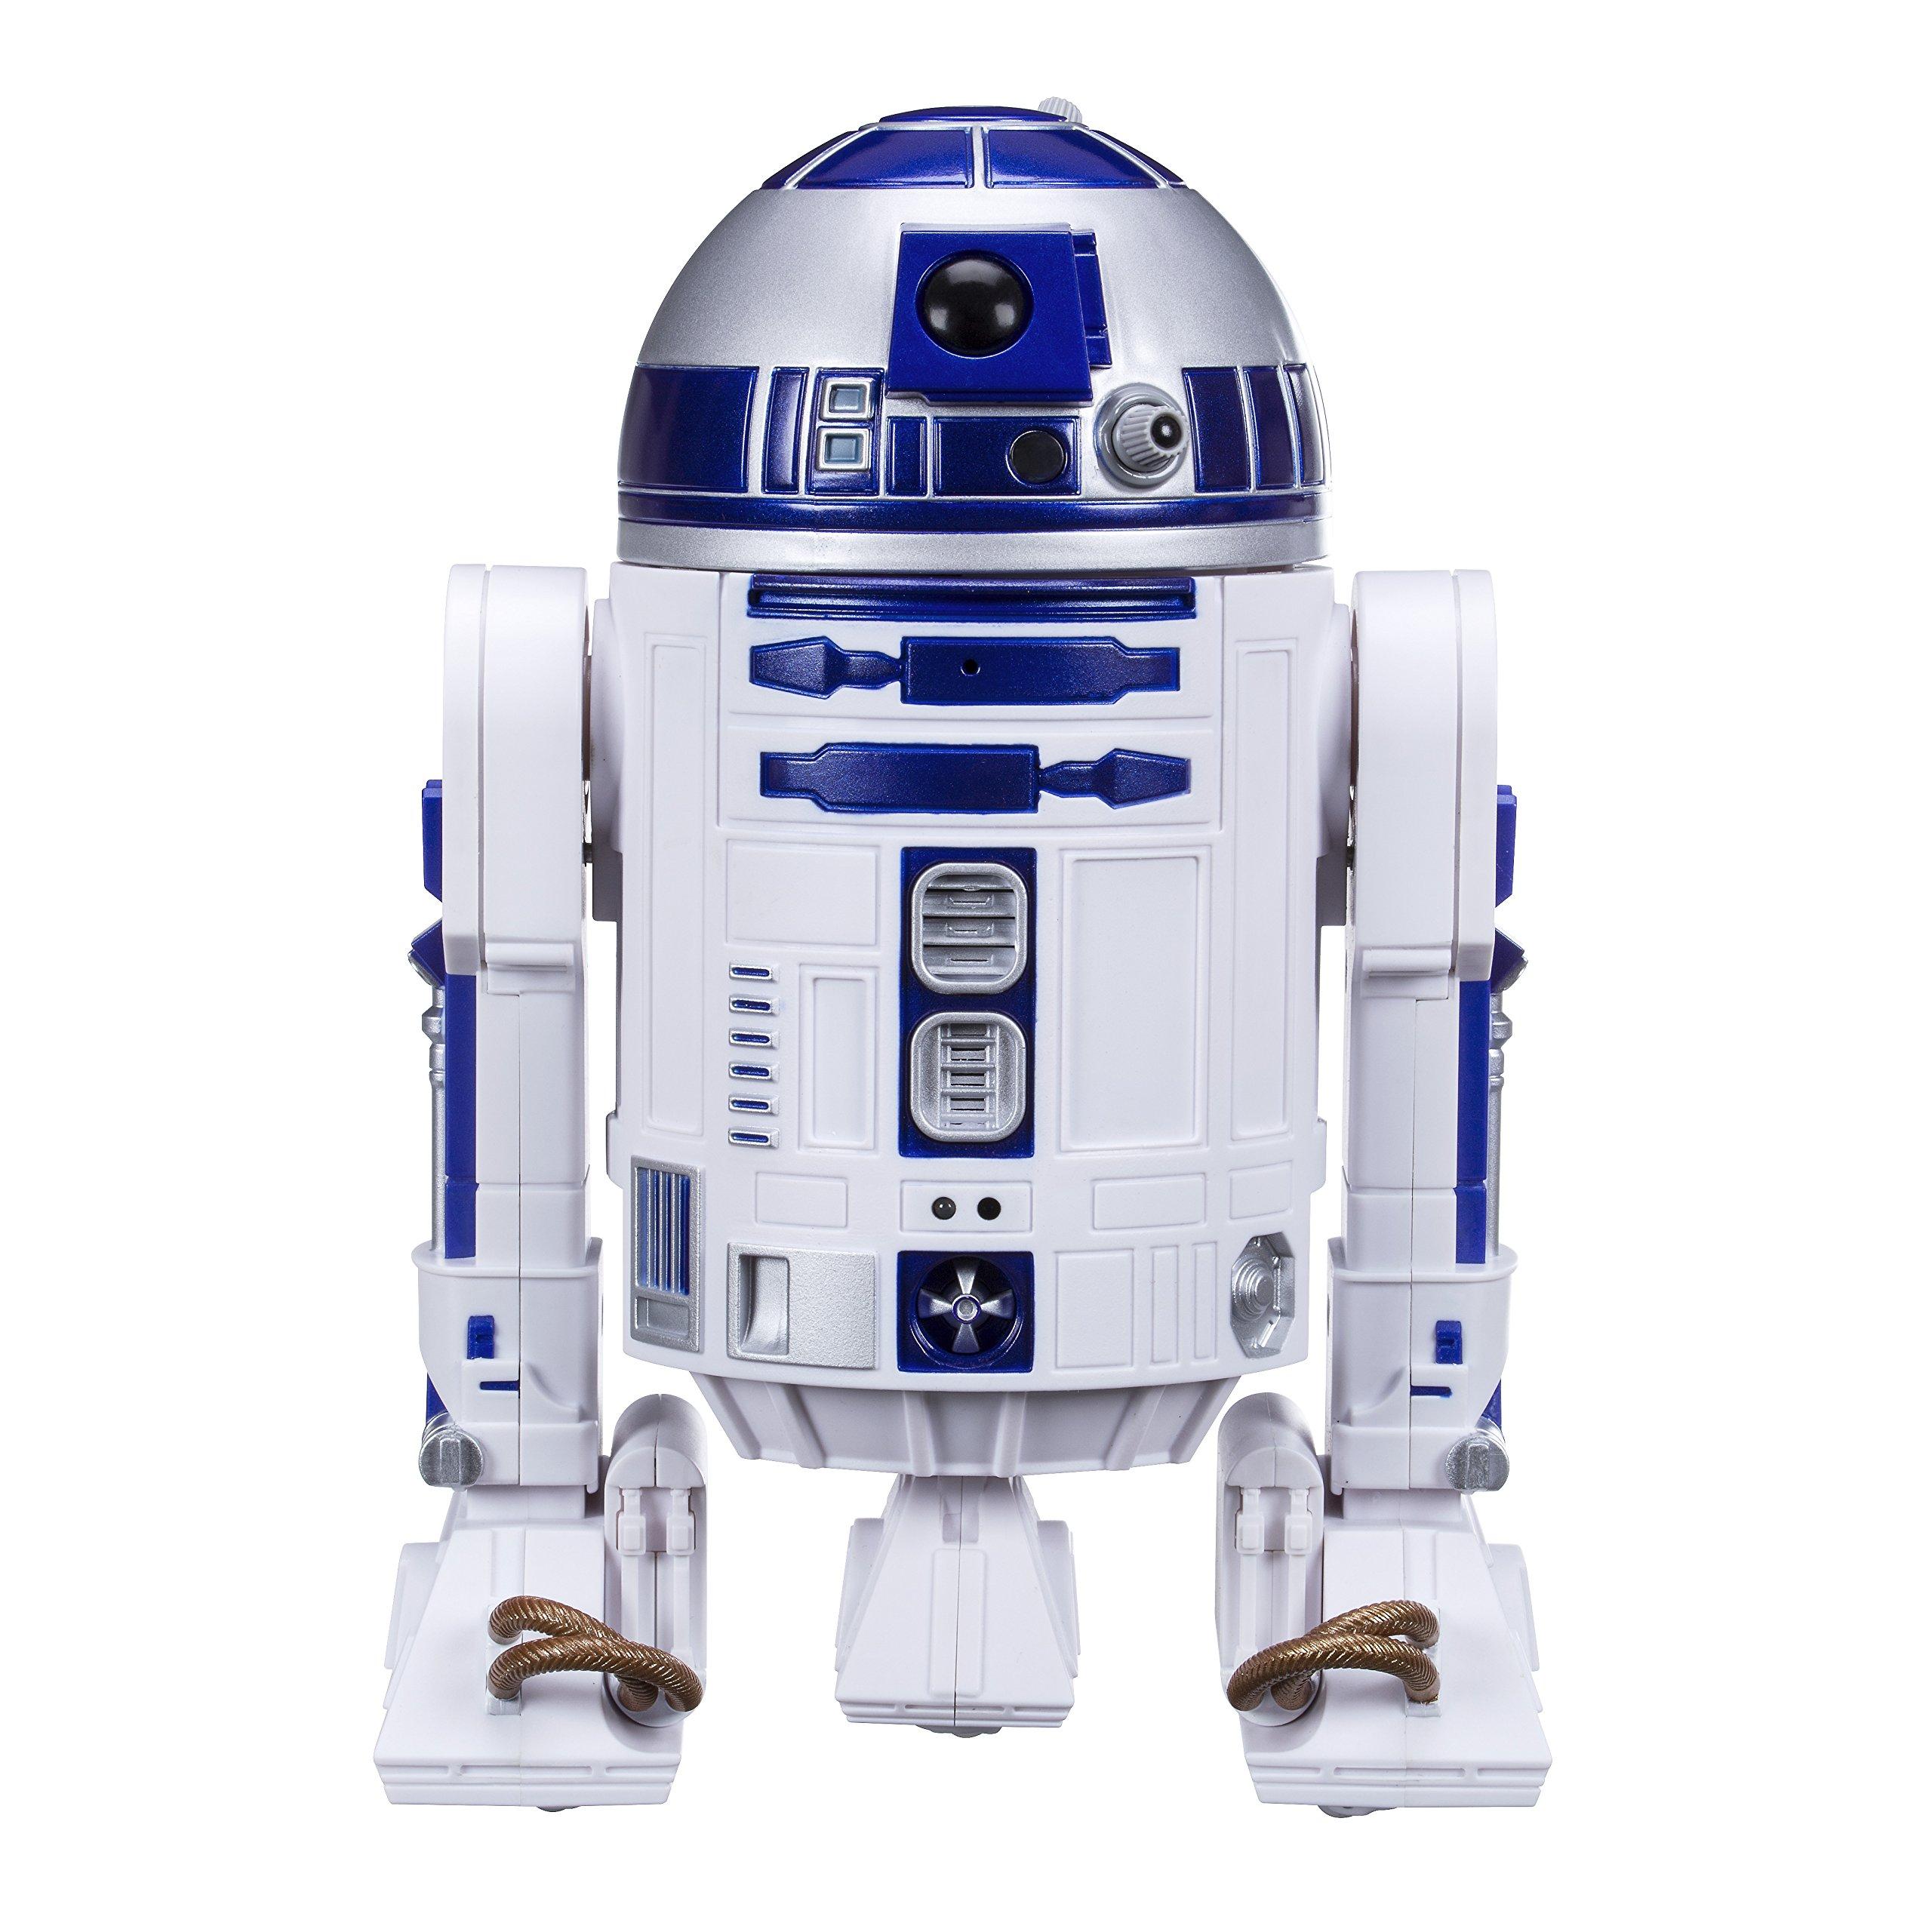 Star Wars SW Movie E7 Robot Inteligente R2D2, Multicolor (Hasbro B7493EU0)